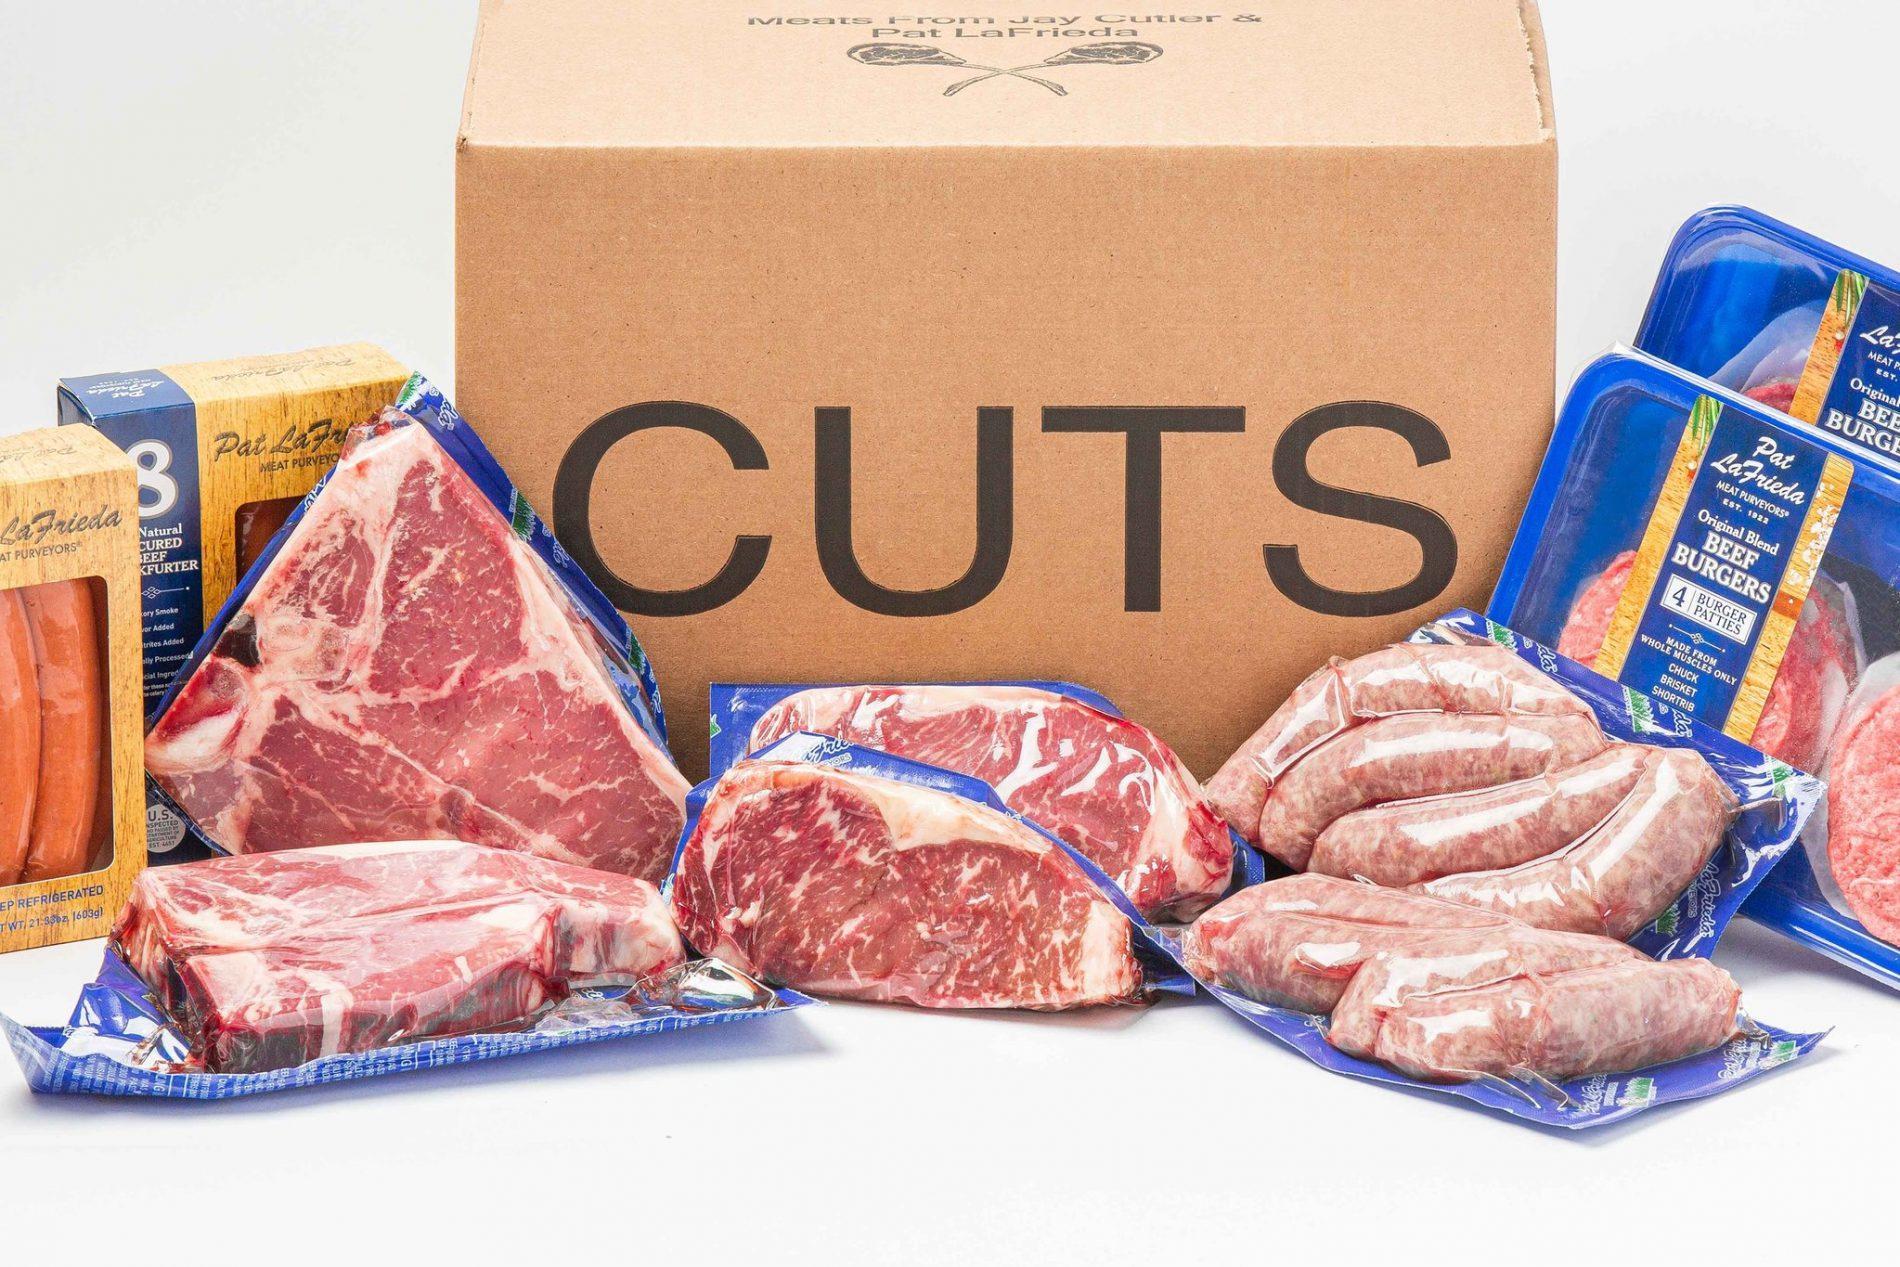 New Box Alert: CUTS by Jay Cutler x Pat LaFrieda